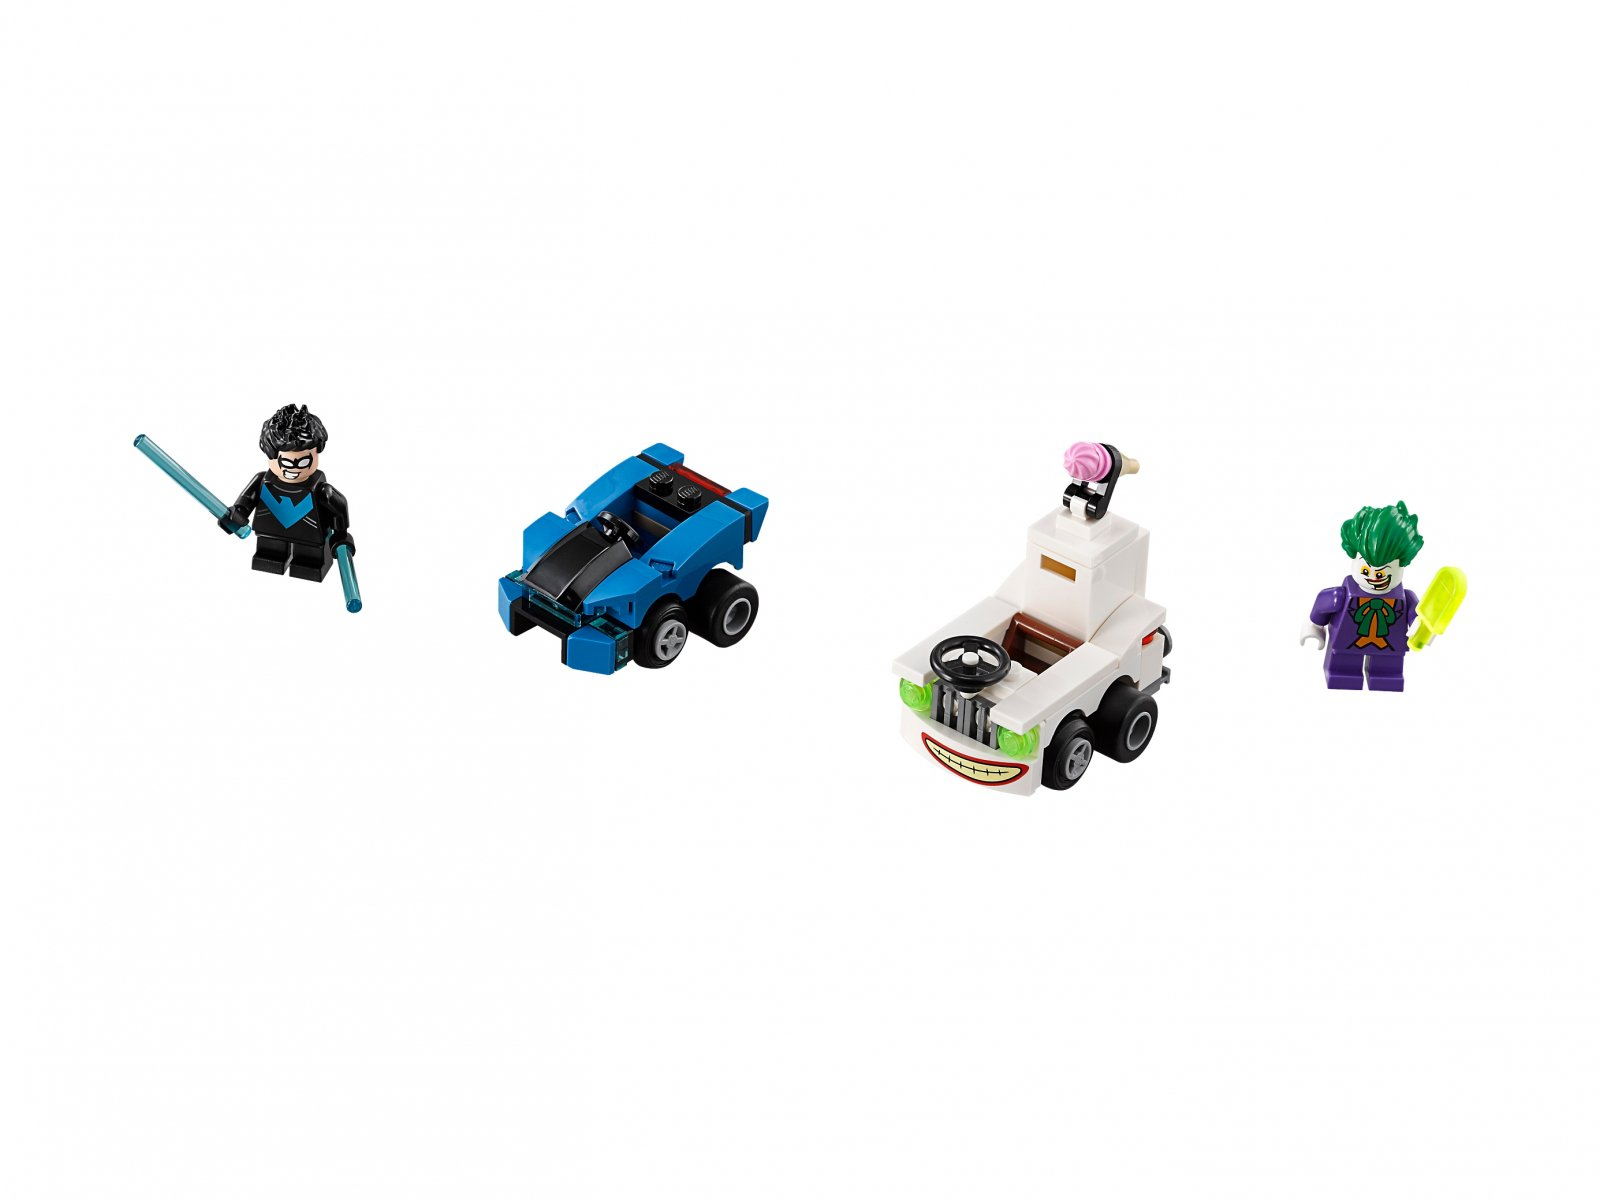 LEGO 76093 Nightwing™ vs. The Joker™